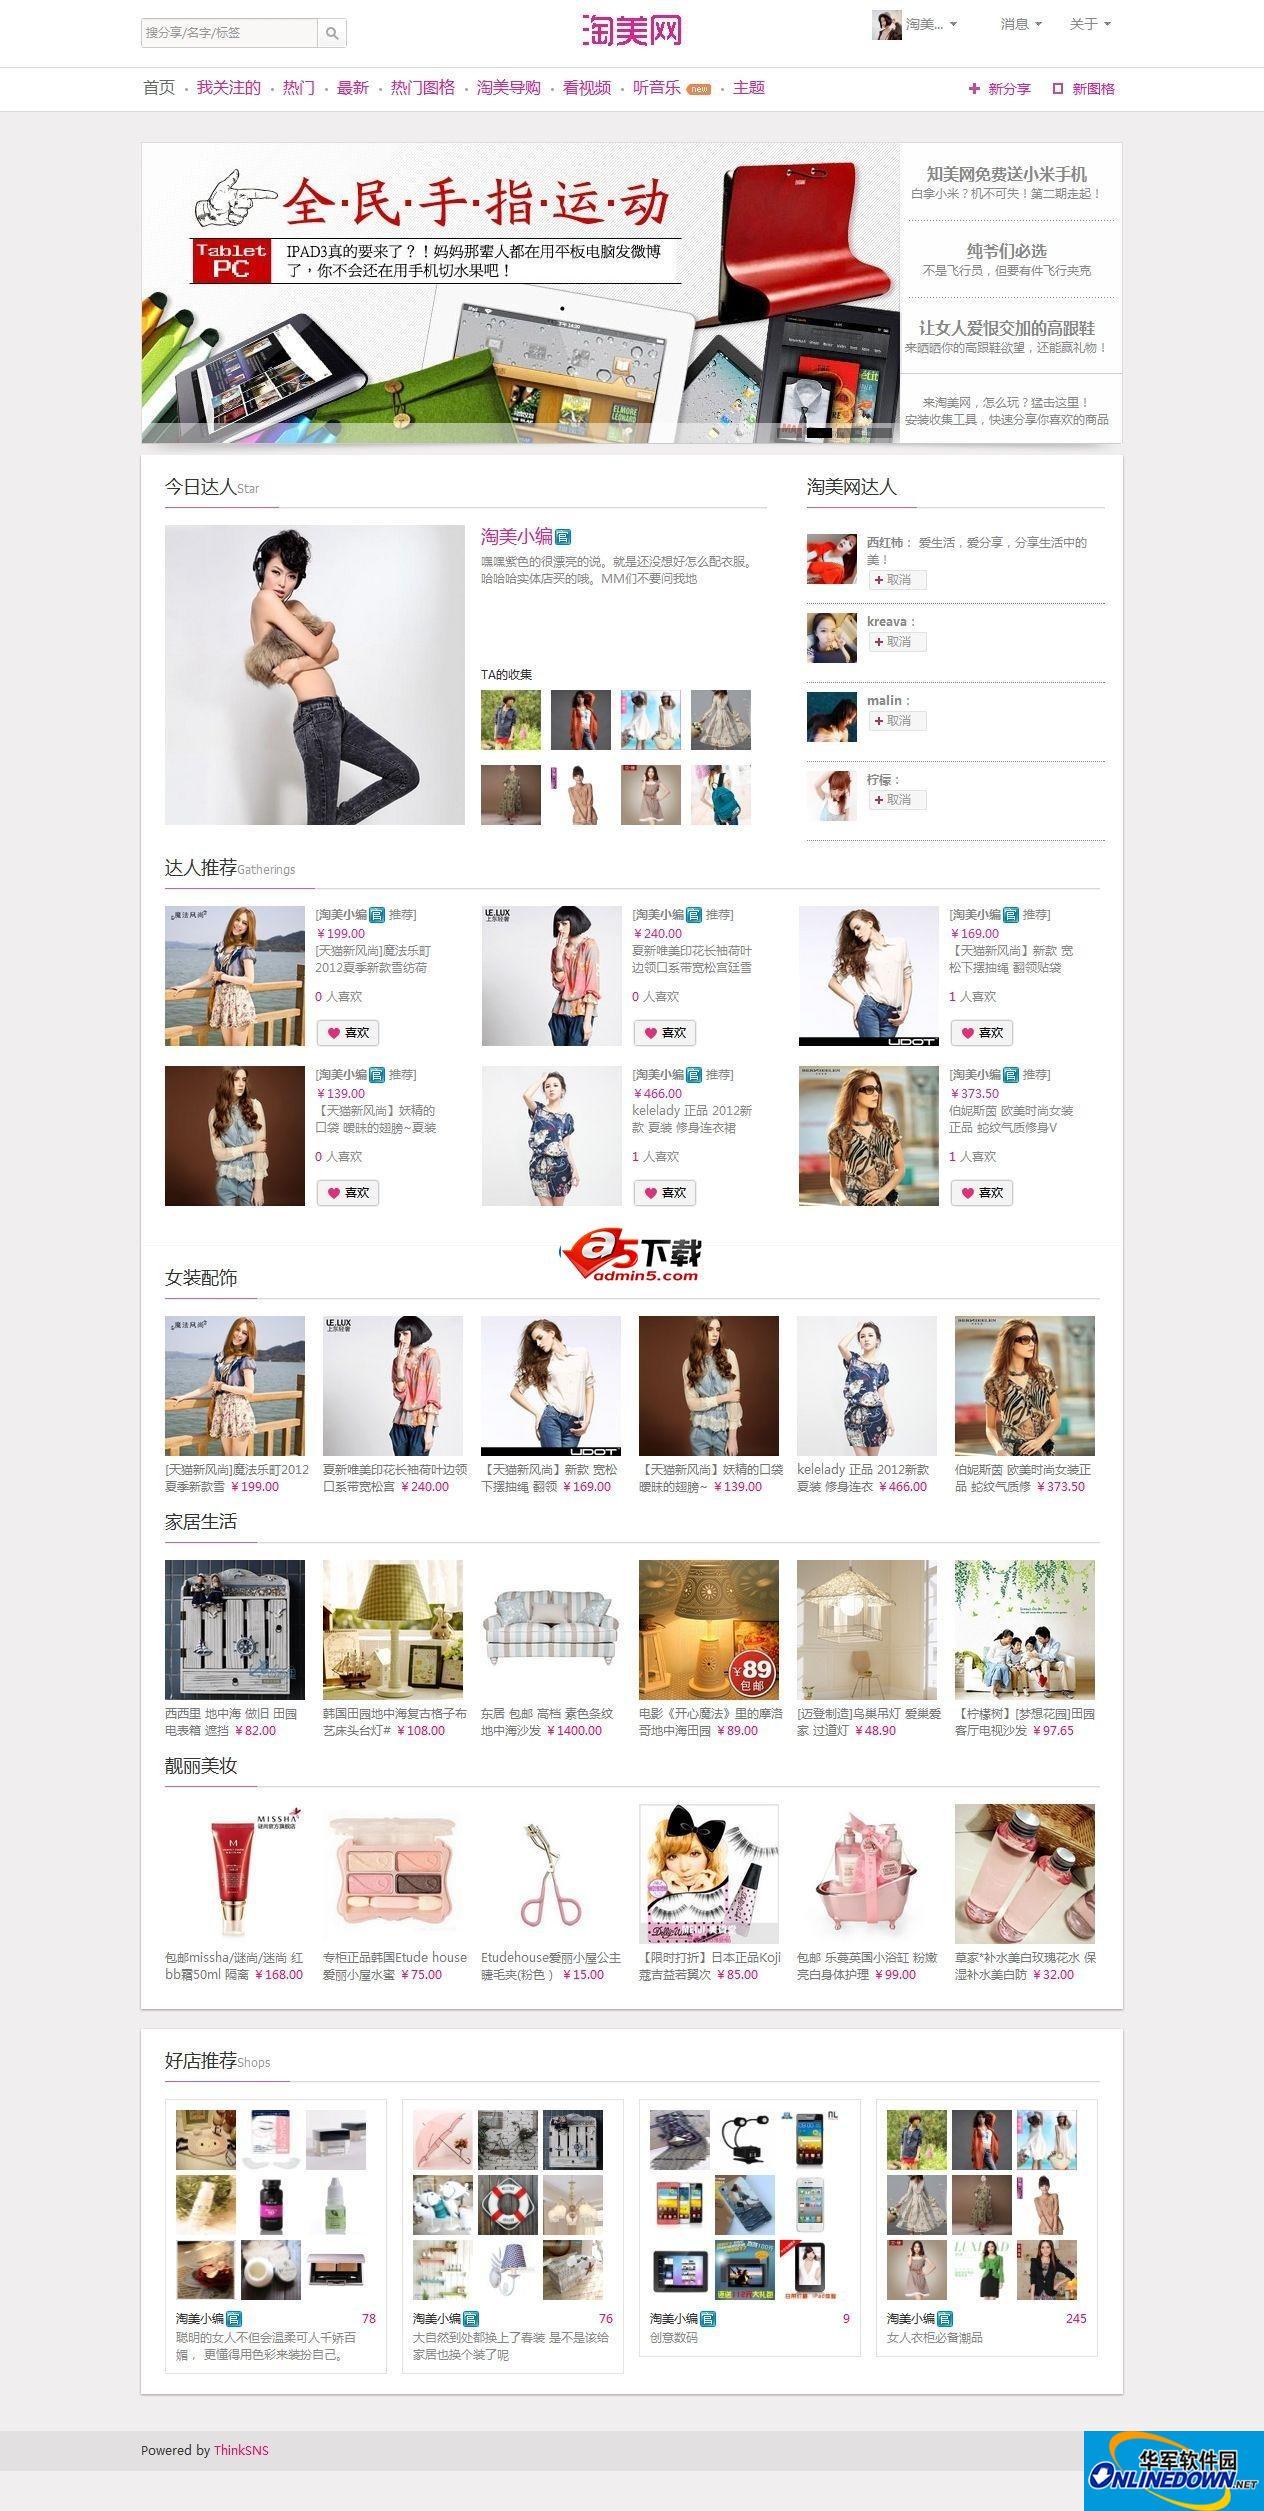 PHP仿Pinterest图谱程序花瓣模板 2.3